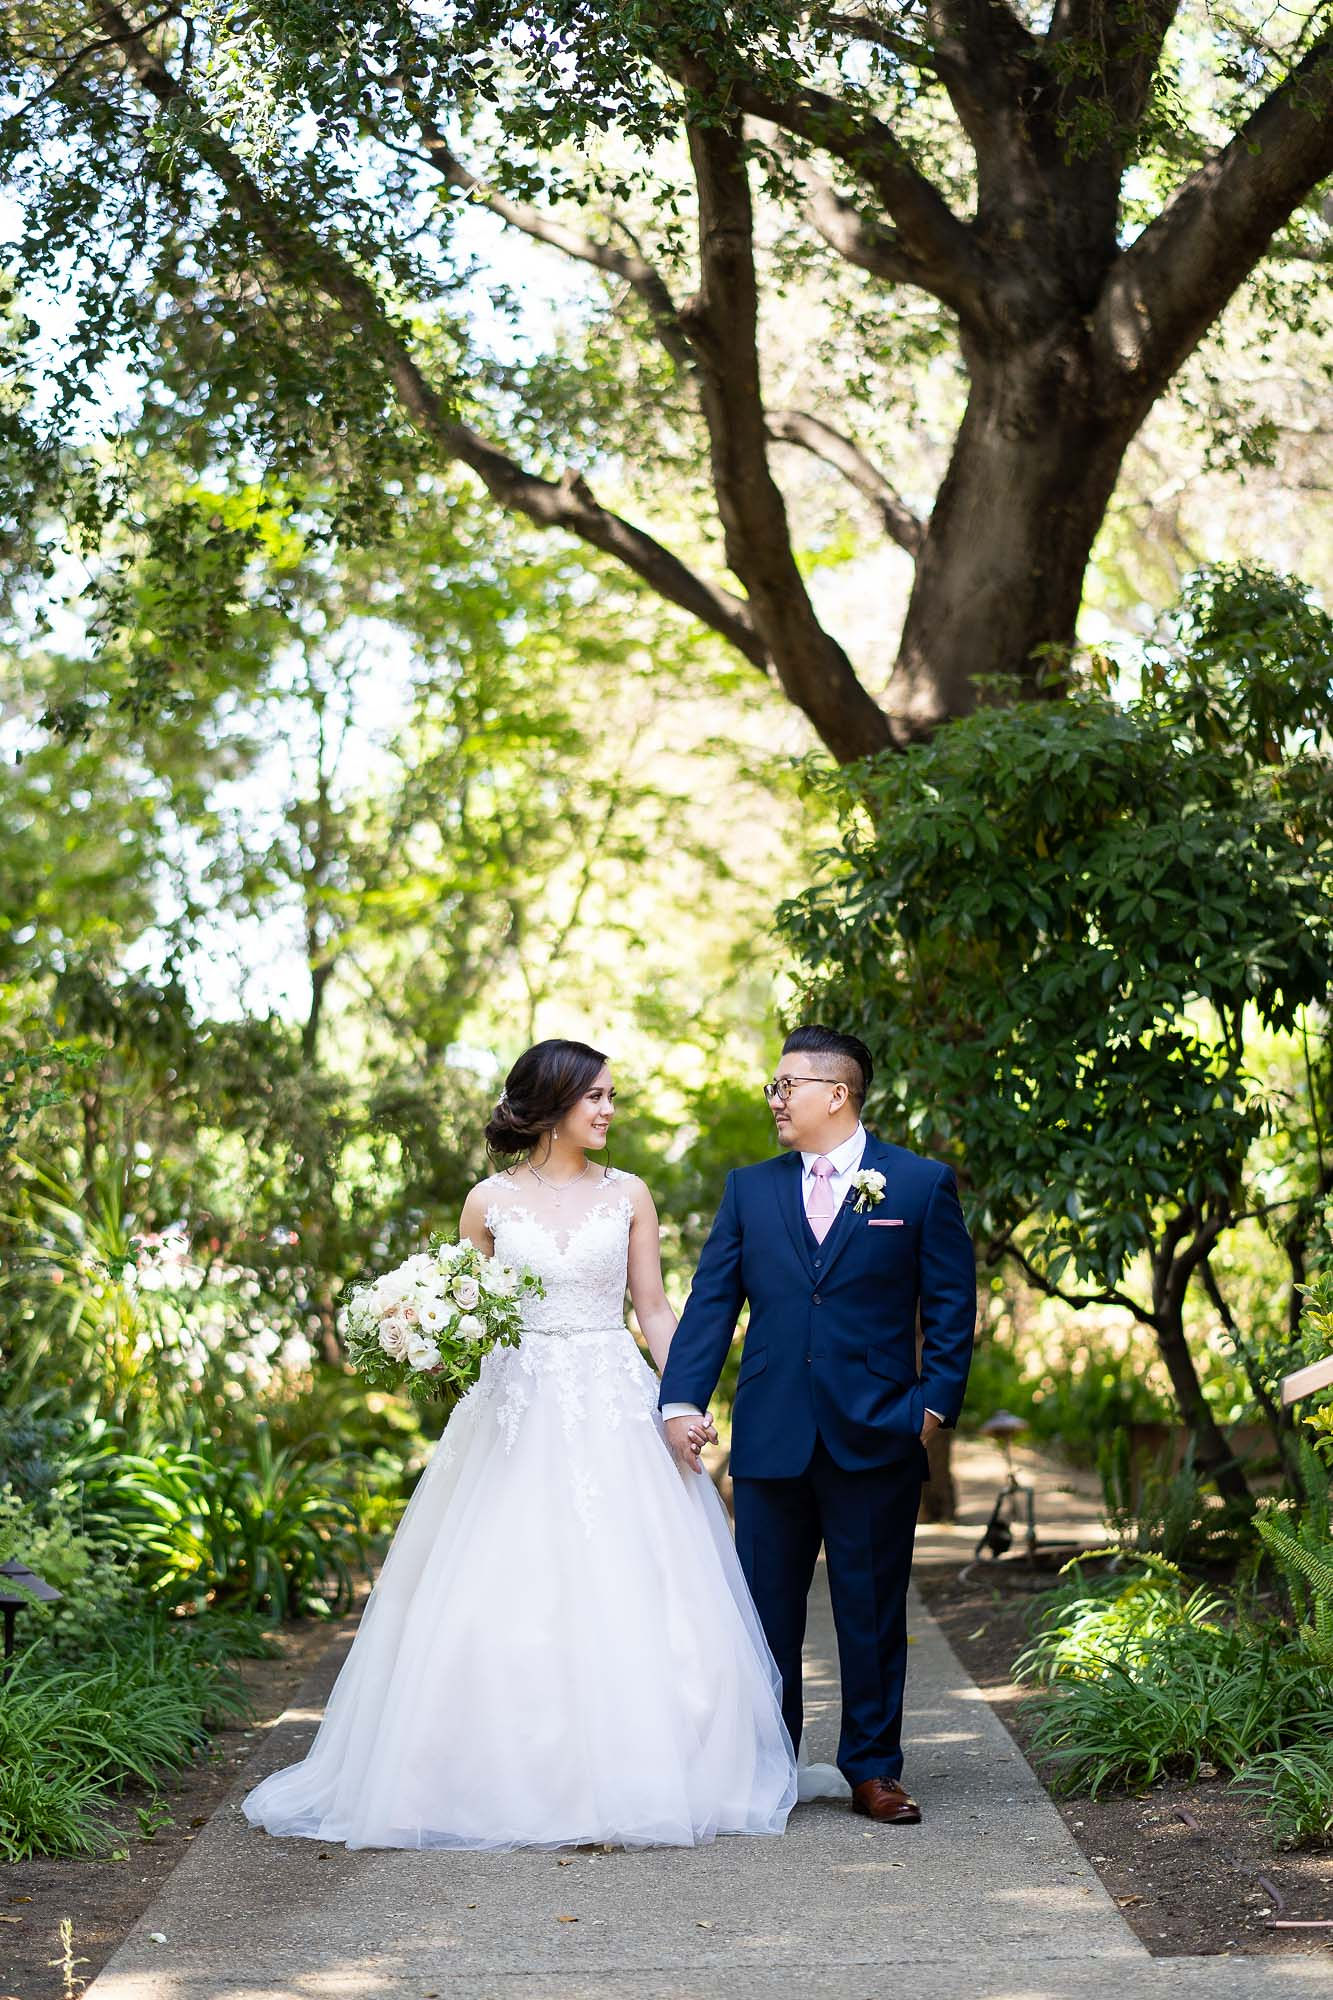 Resized-S&S-WeddingHighlights-12.jpg